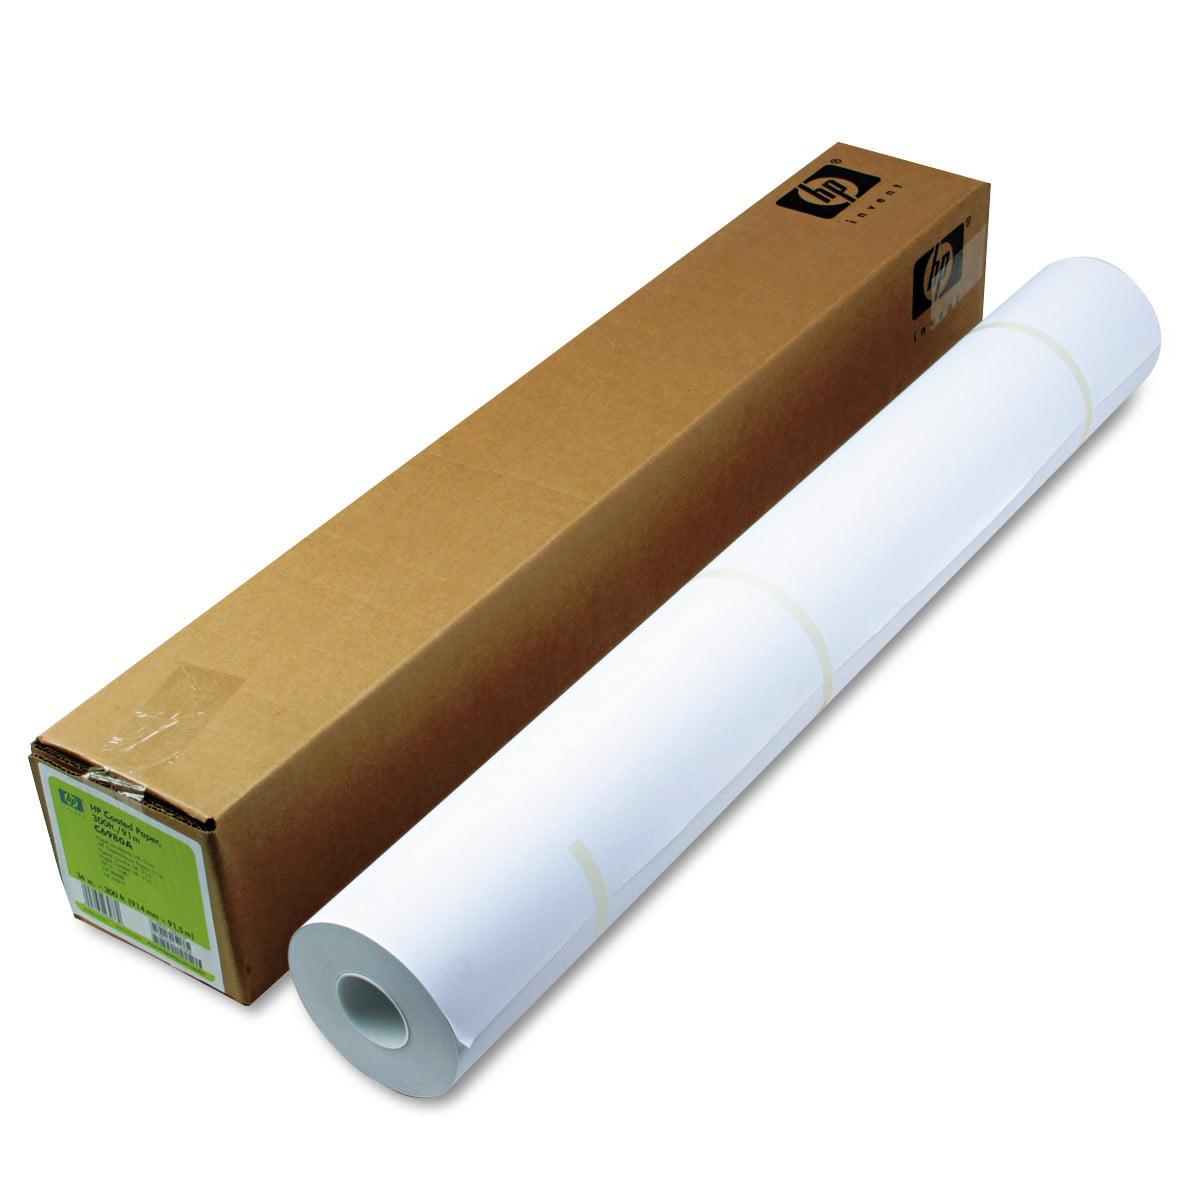 "HP Designjet Inkjet Large Format Paper, 4.5 mil, 36"" x 300 ft, White -HEWC6980A"